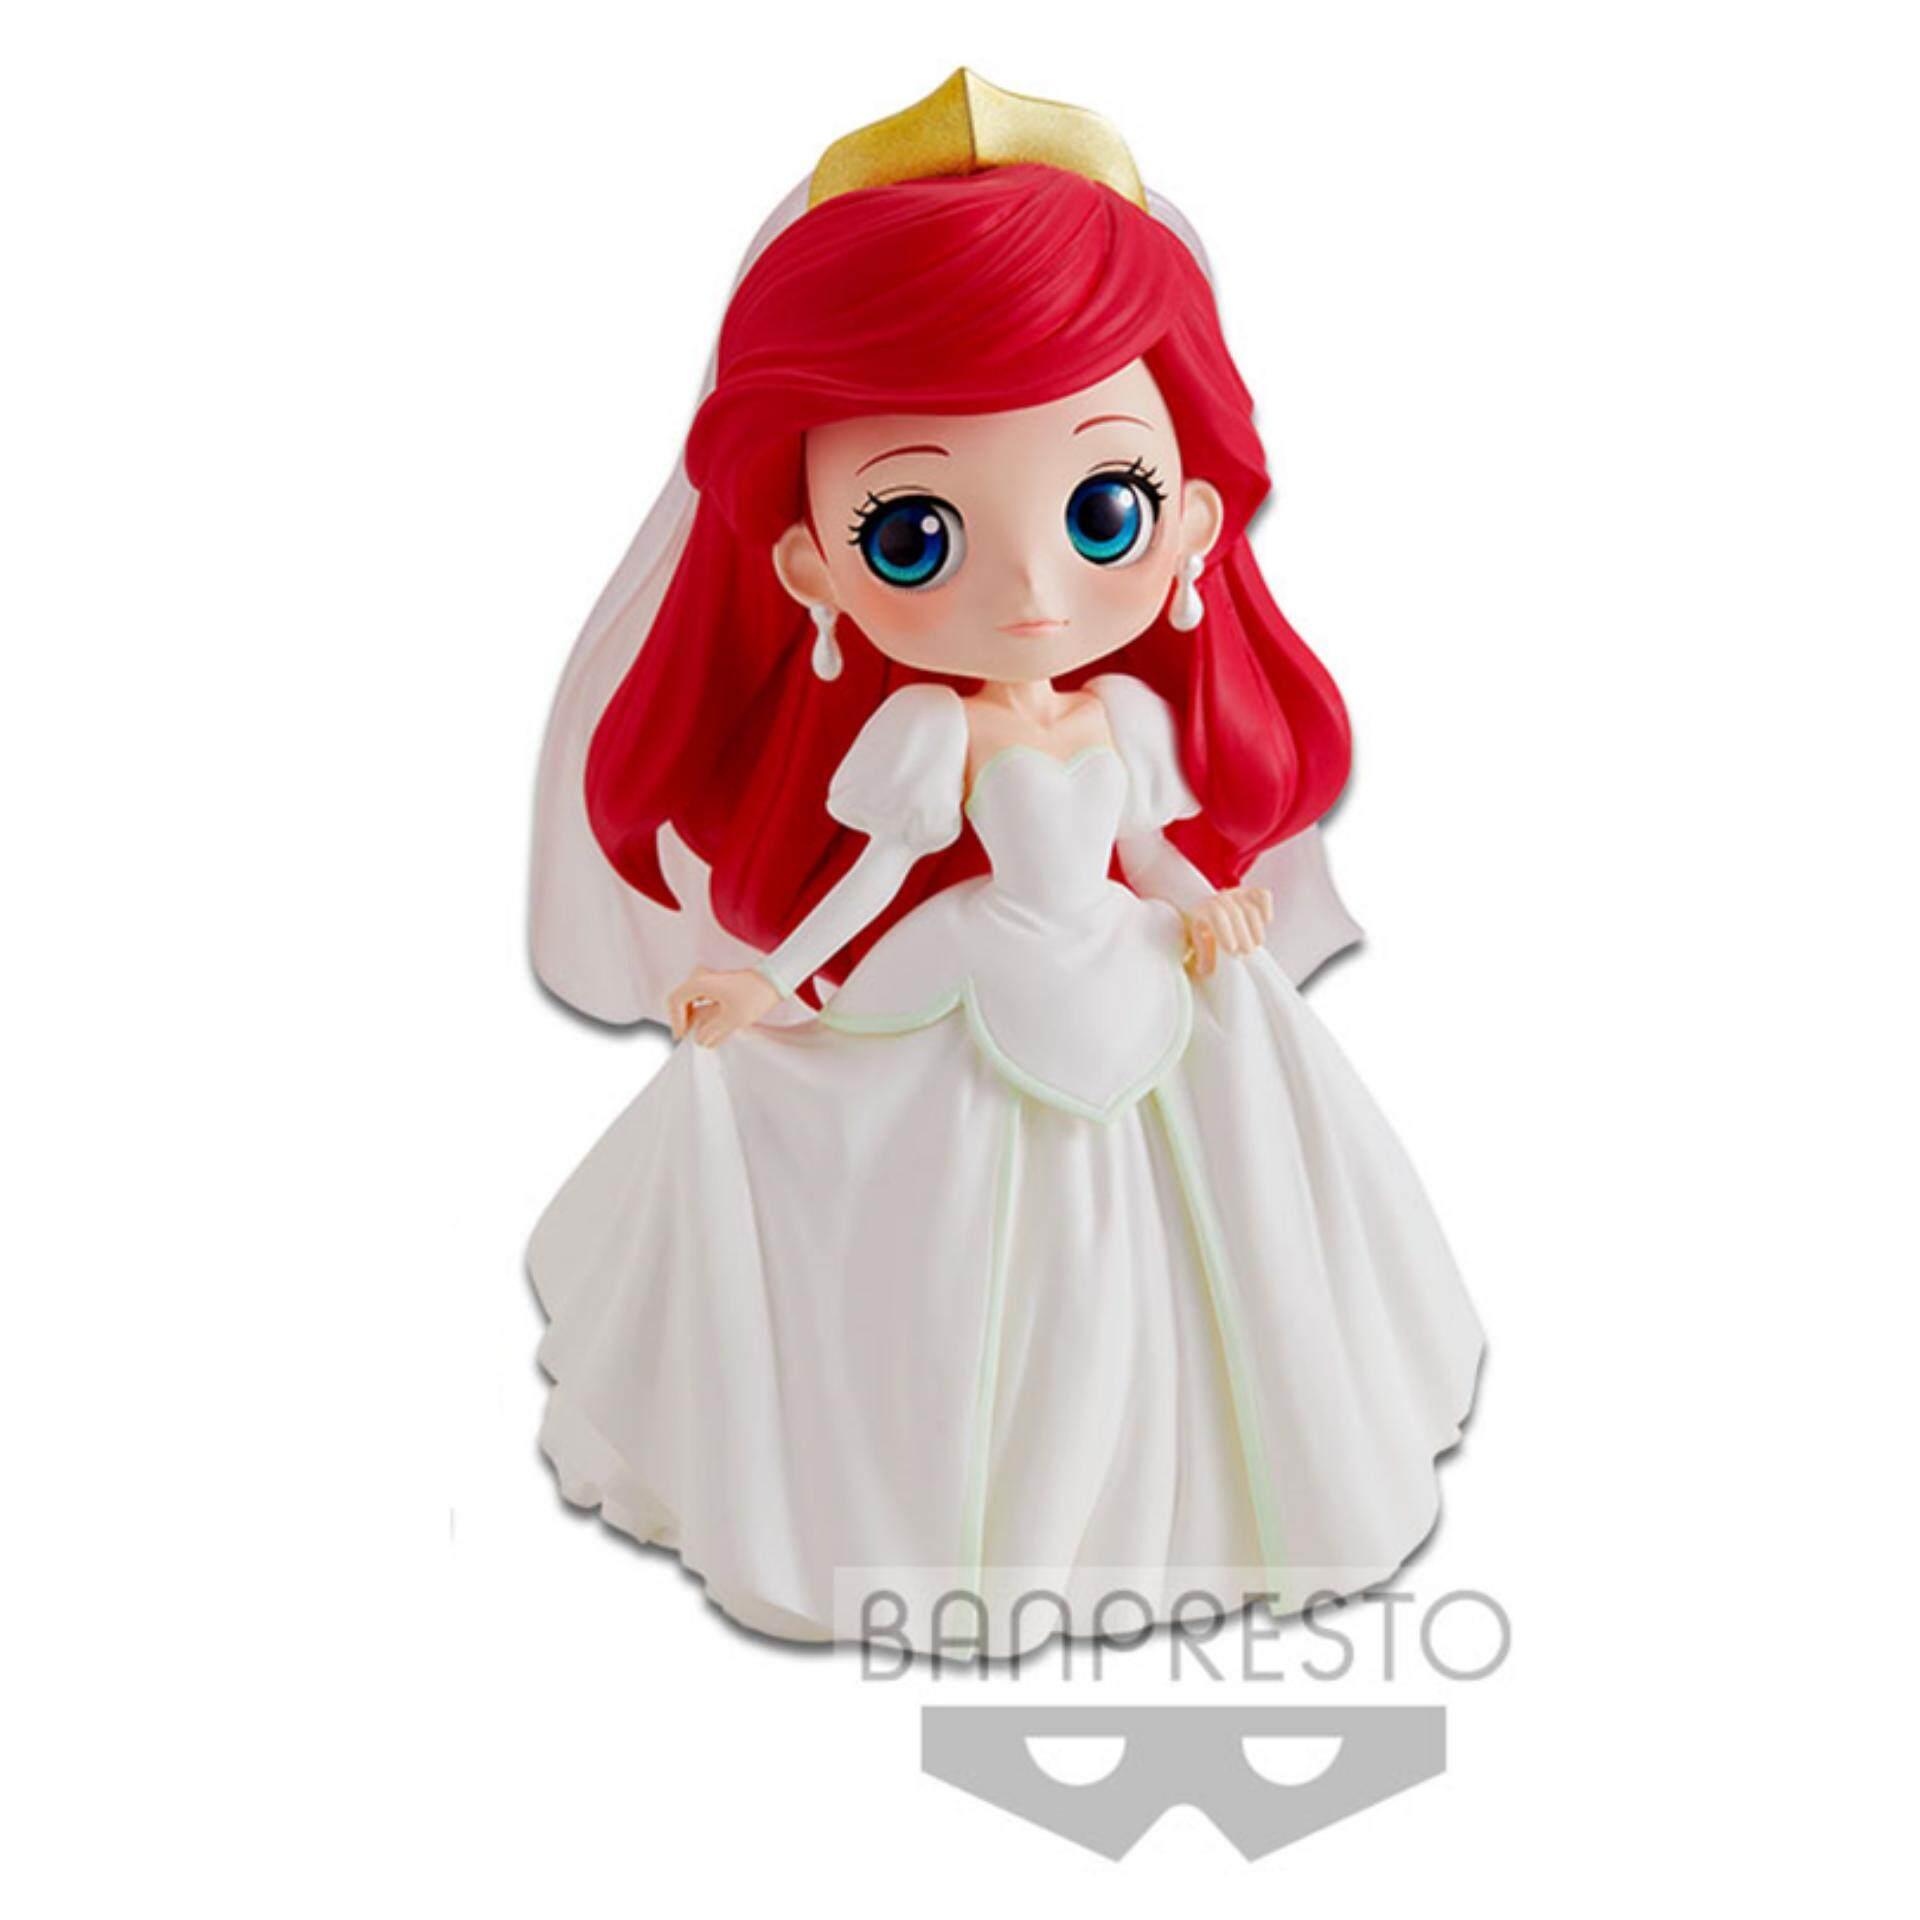 Banpresto Q Posket Disney Princess Figure Pastel Version - Ariel Dreamy Style Toys for boys